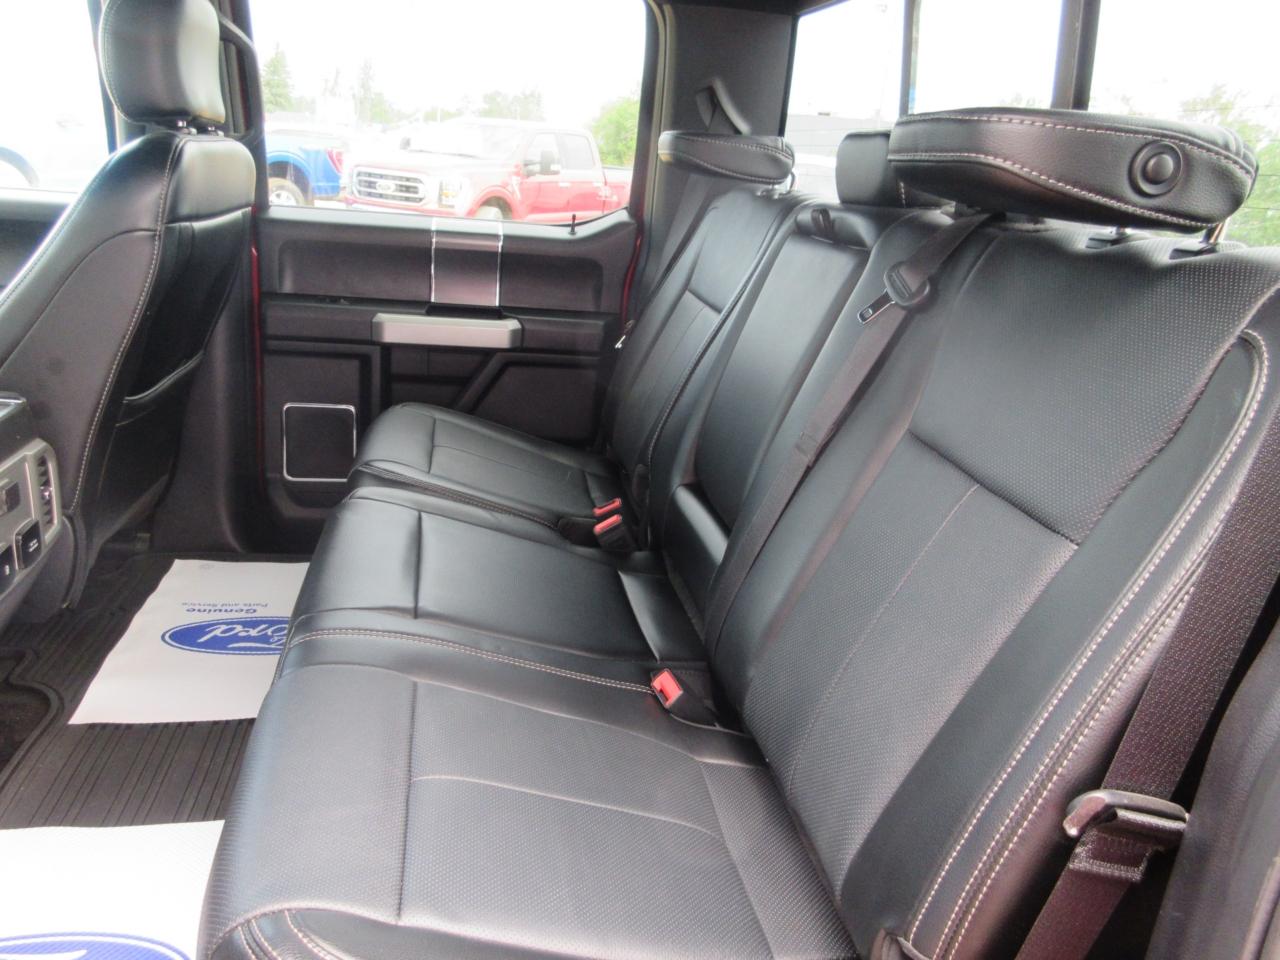 2018 Ford F-150 4WD SuperCrew Box